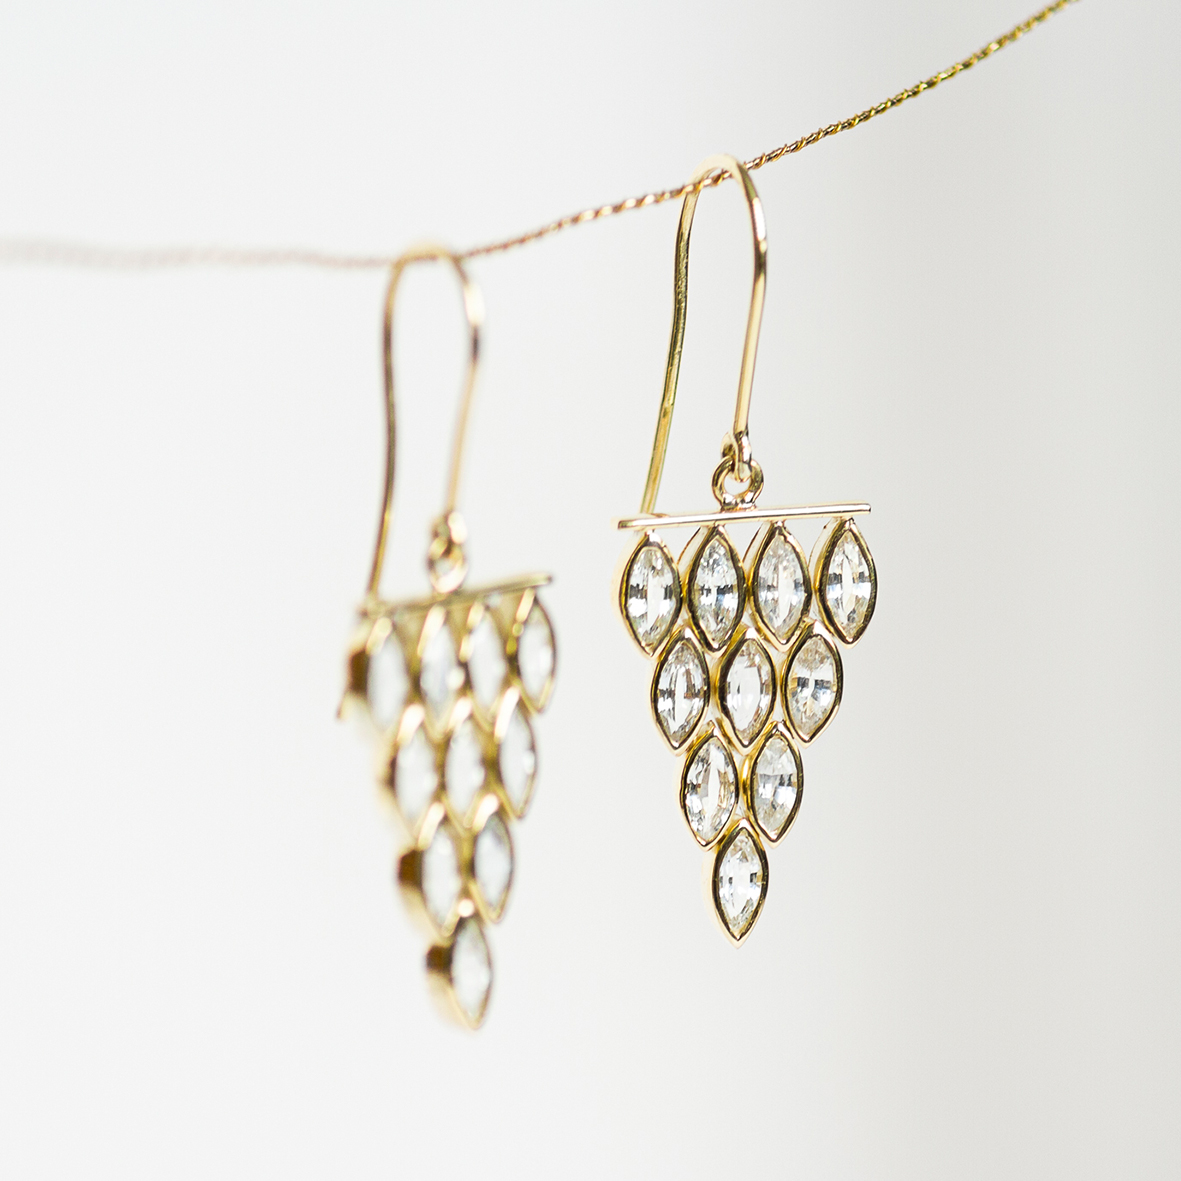 2. OONA_philo_ficha1_cascade marquise sapphire earrings